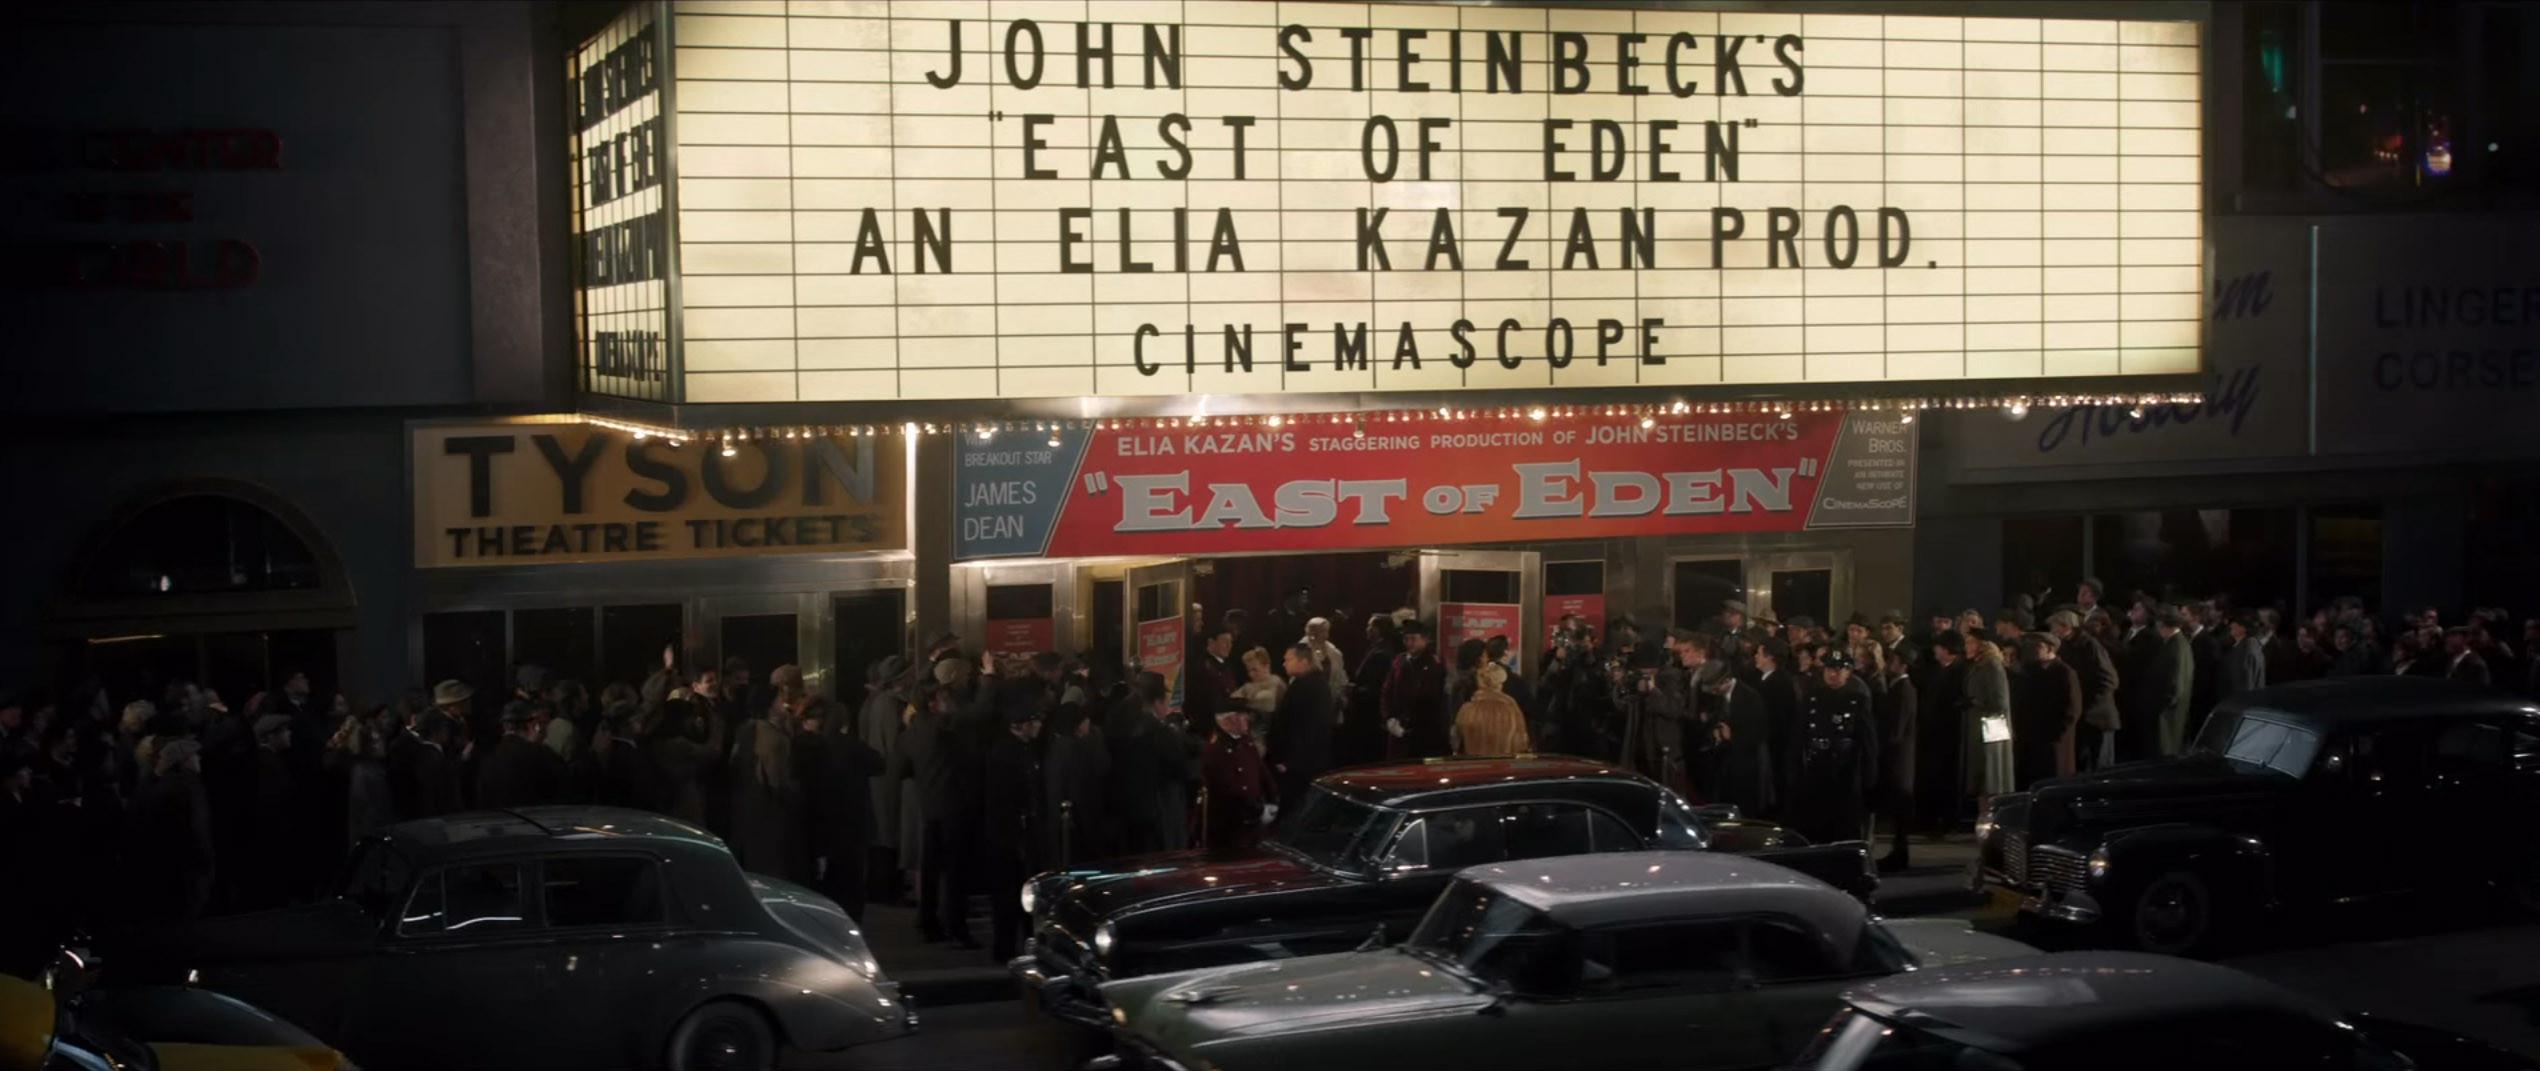 Cinema entry